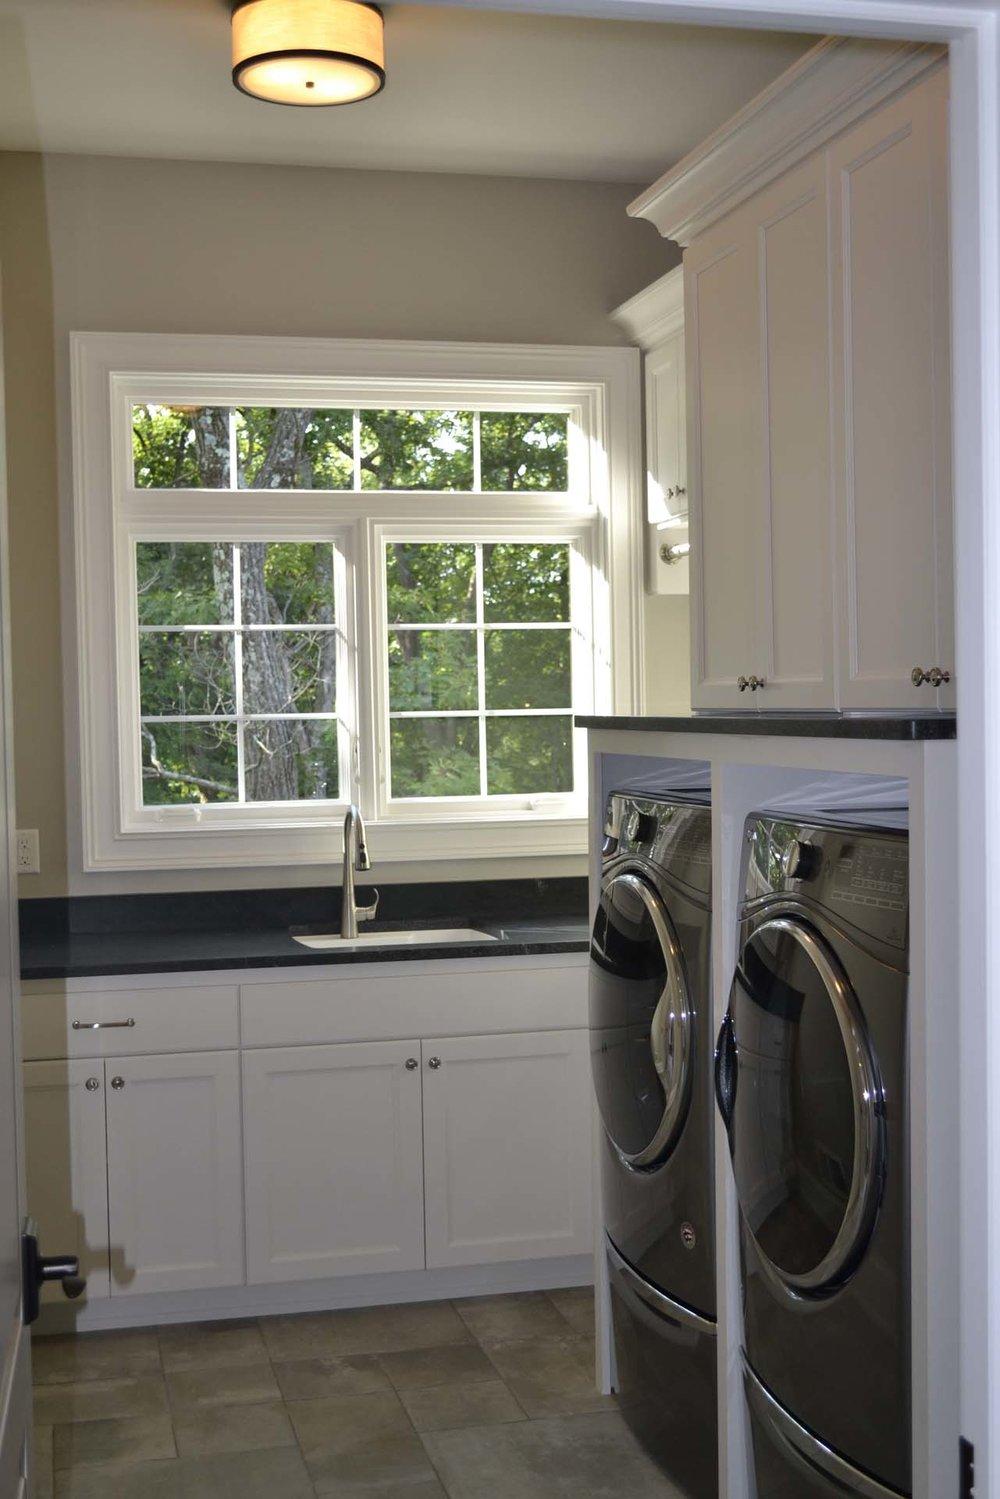 RMH_Delafield_Grand_Homestead_laundry 4.jpg